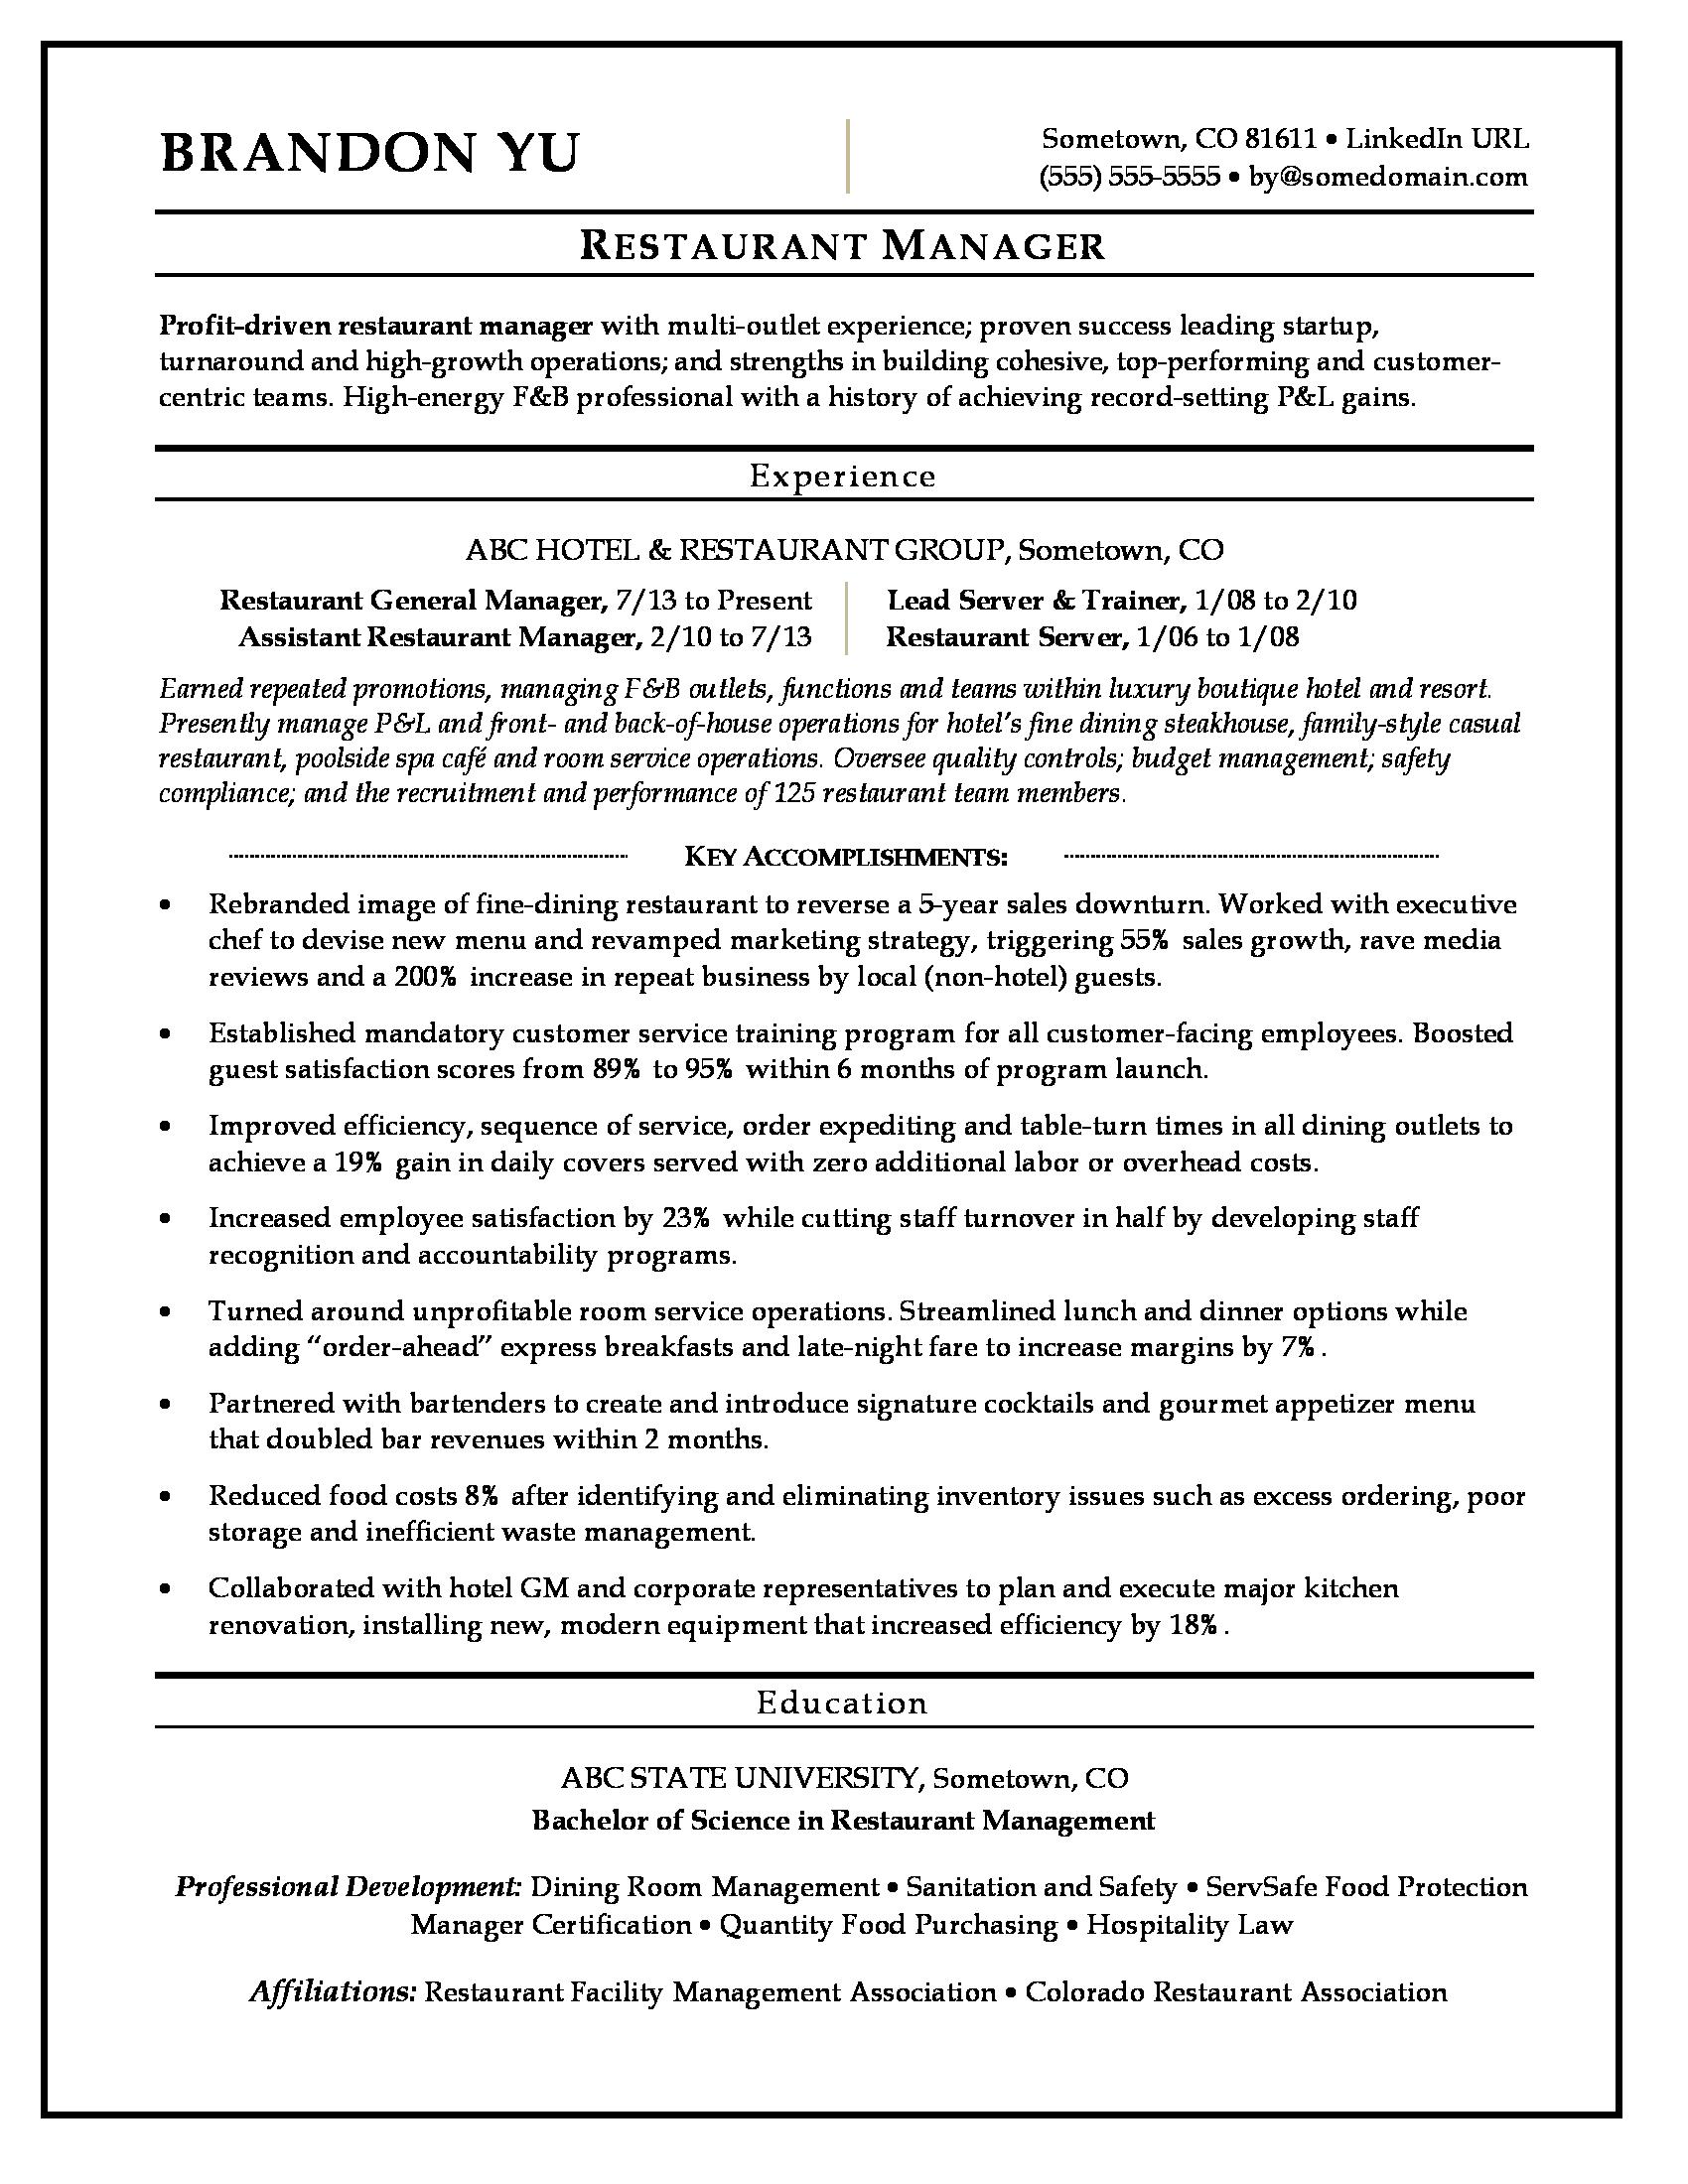 Texas Unemployment Worksheet